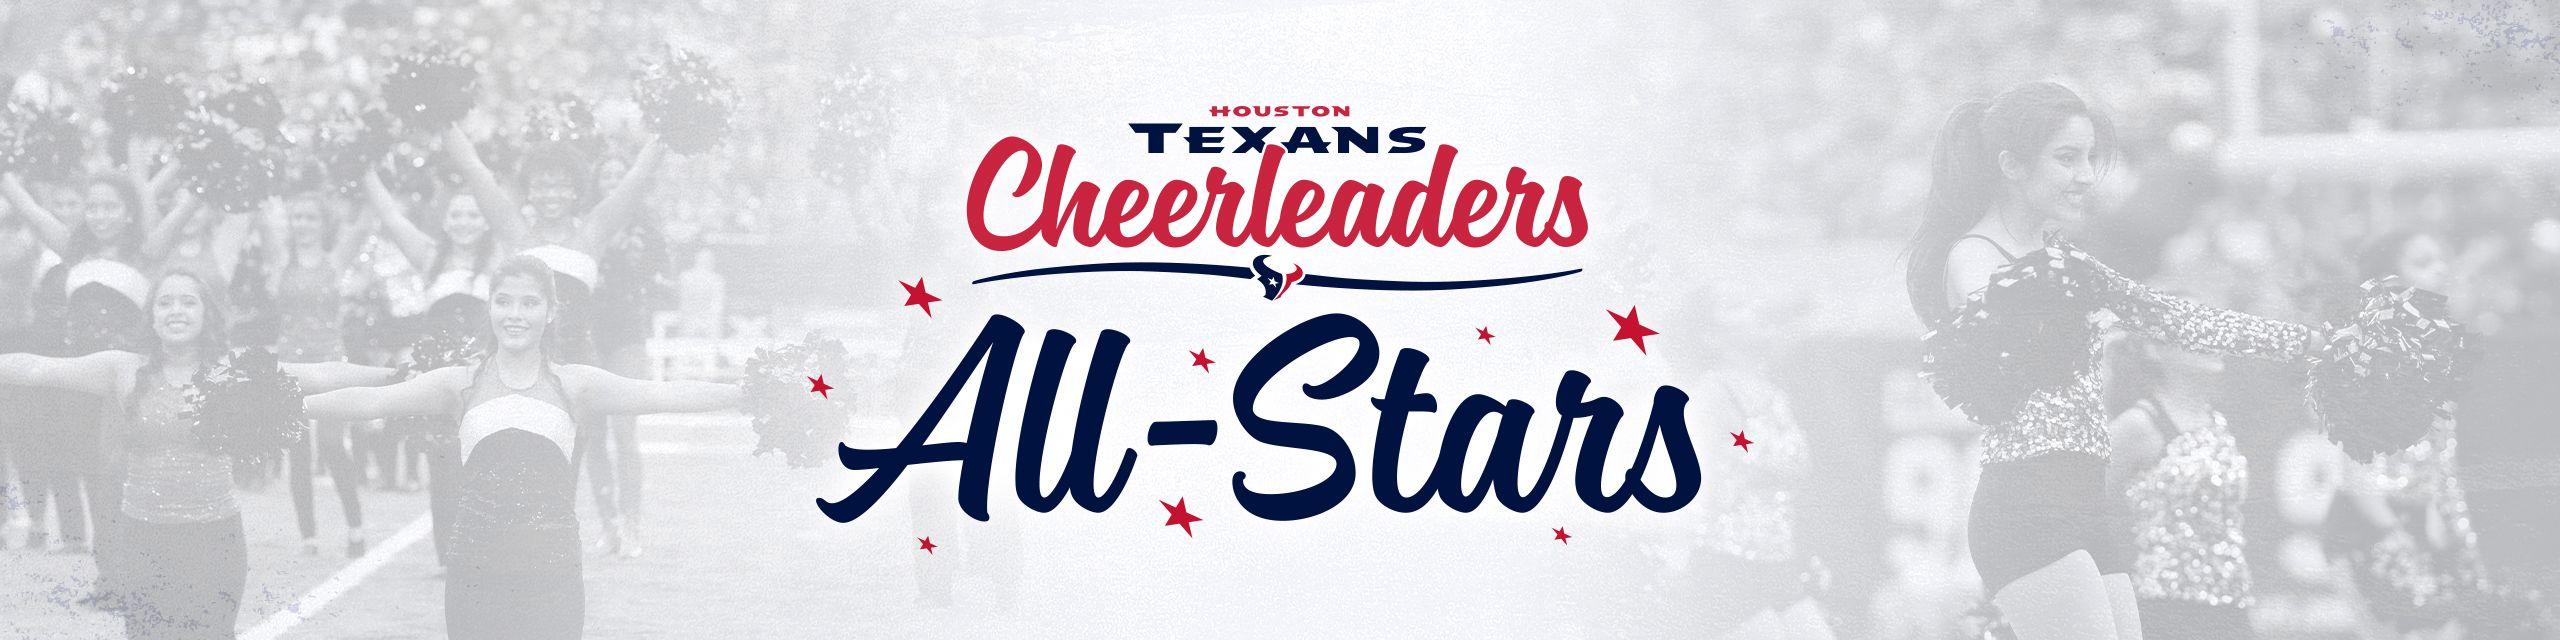 All-Star Cheerleaders